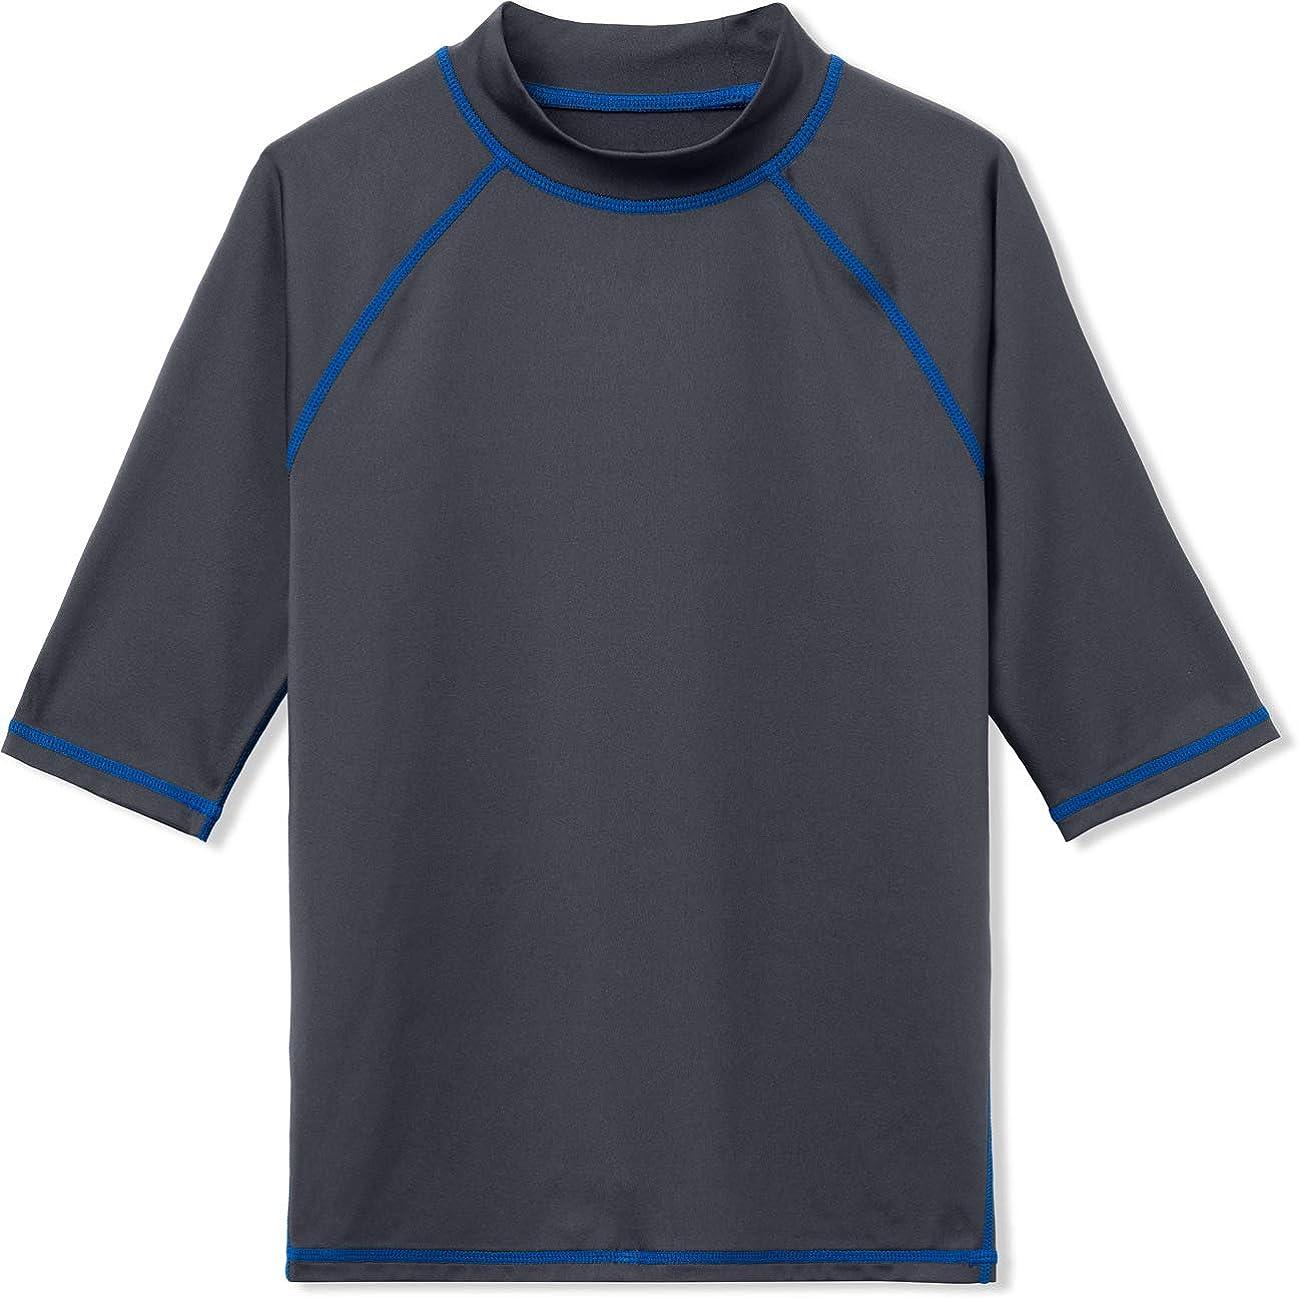 TSLA UPF 50+ Youth Kids Rash Guard Short Sleeve, UV/SPF Surf Swim Shirt, Aqua Water Swimsuit Top: Clothing